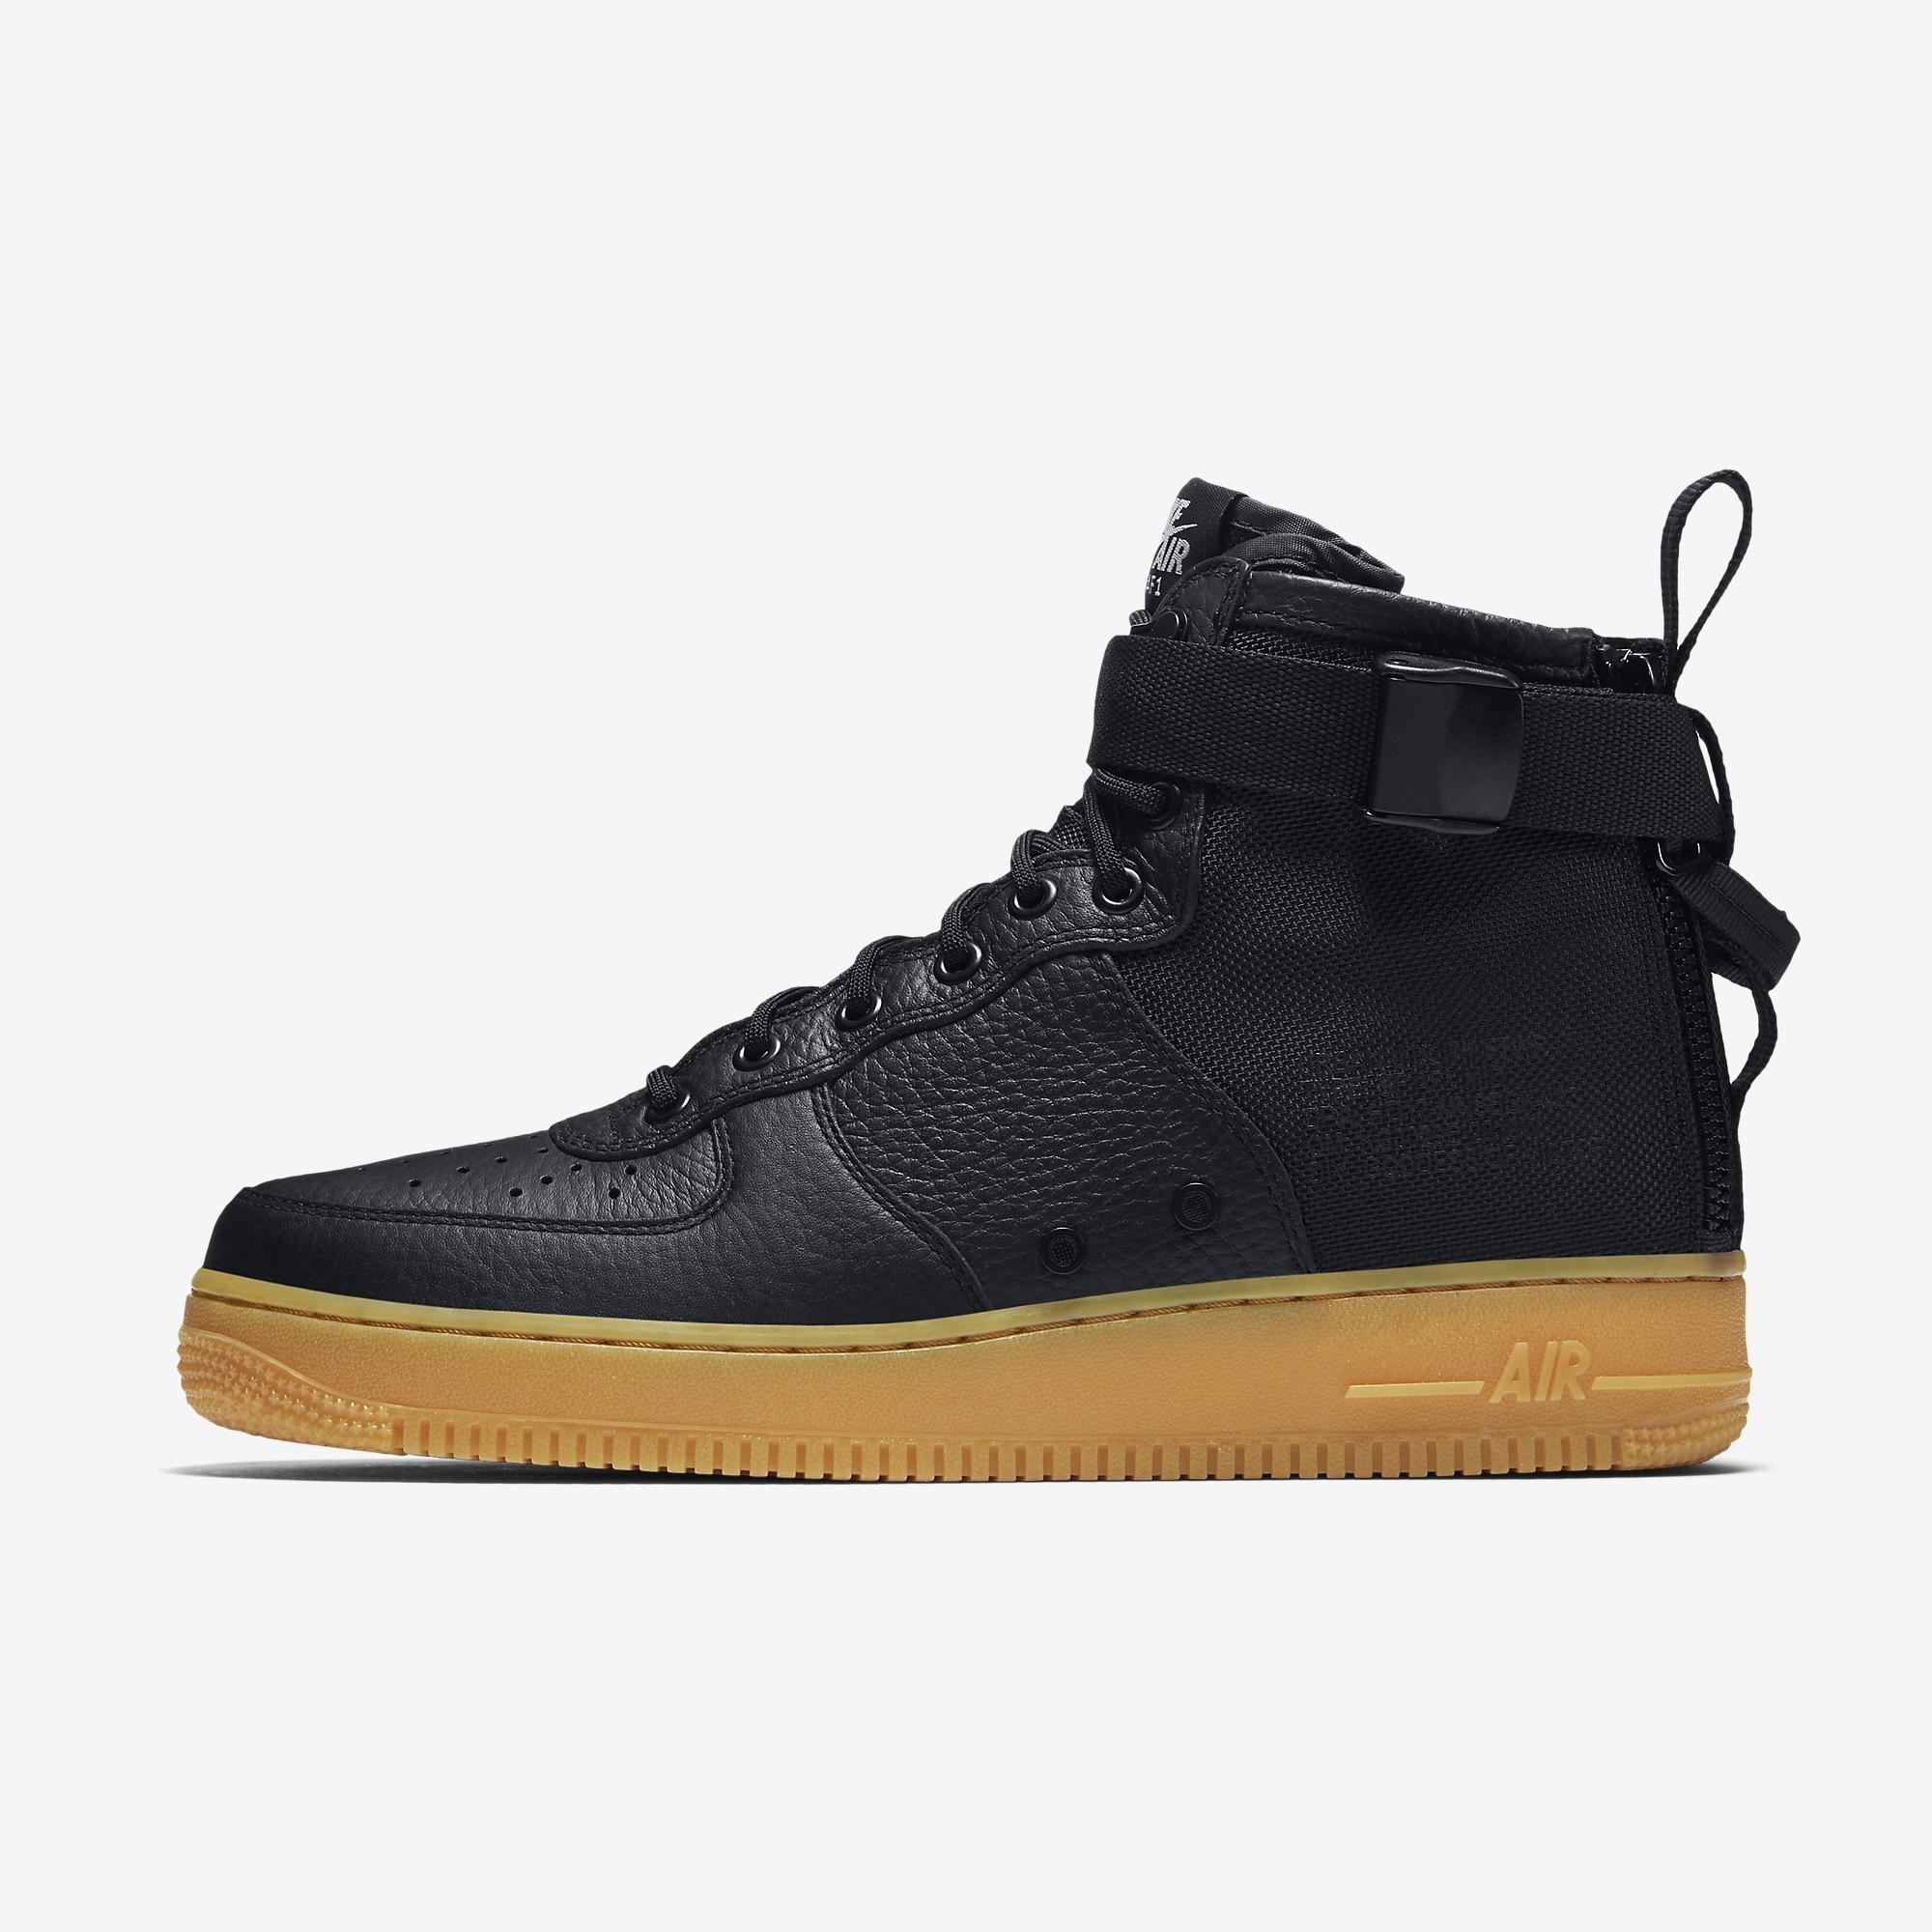 low priced 74b47 8a25b Nike SF-AF1 Mid Black Gum 917753-003   SneakerNews.com